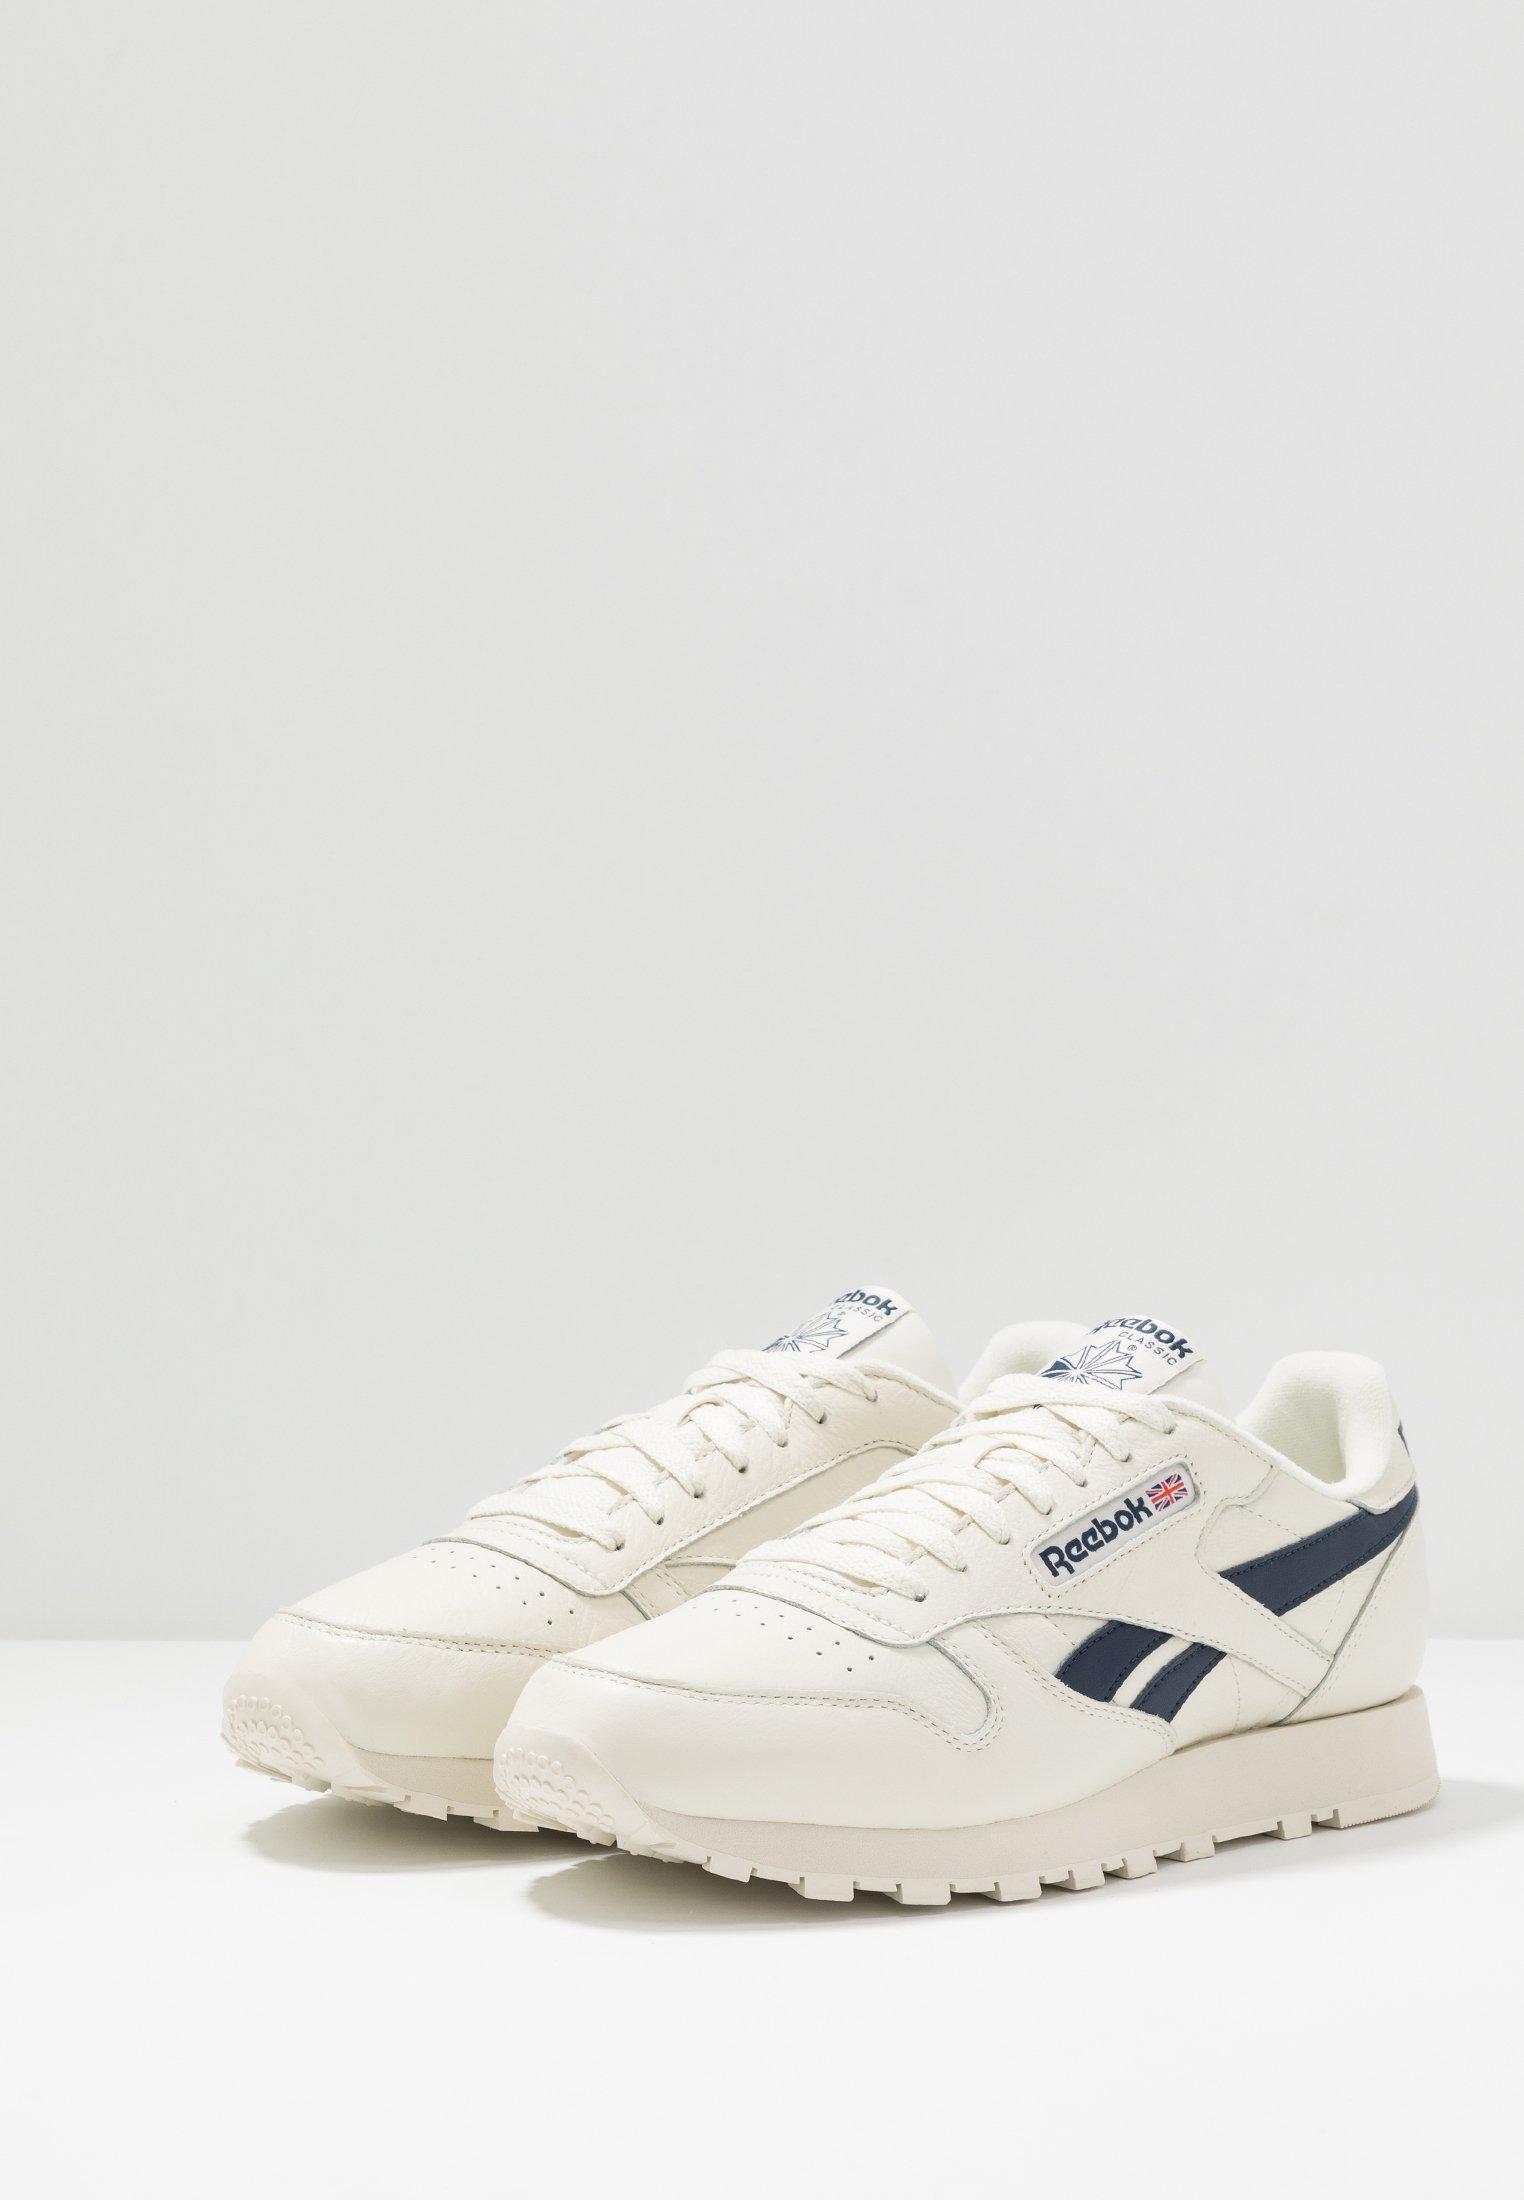 CLUB C 85 LEATHER UPPER SHOES Sneakers laag chalkpaperwhitecollegiate navy